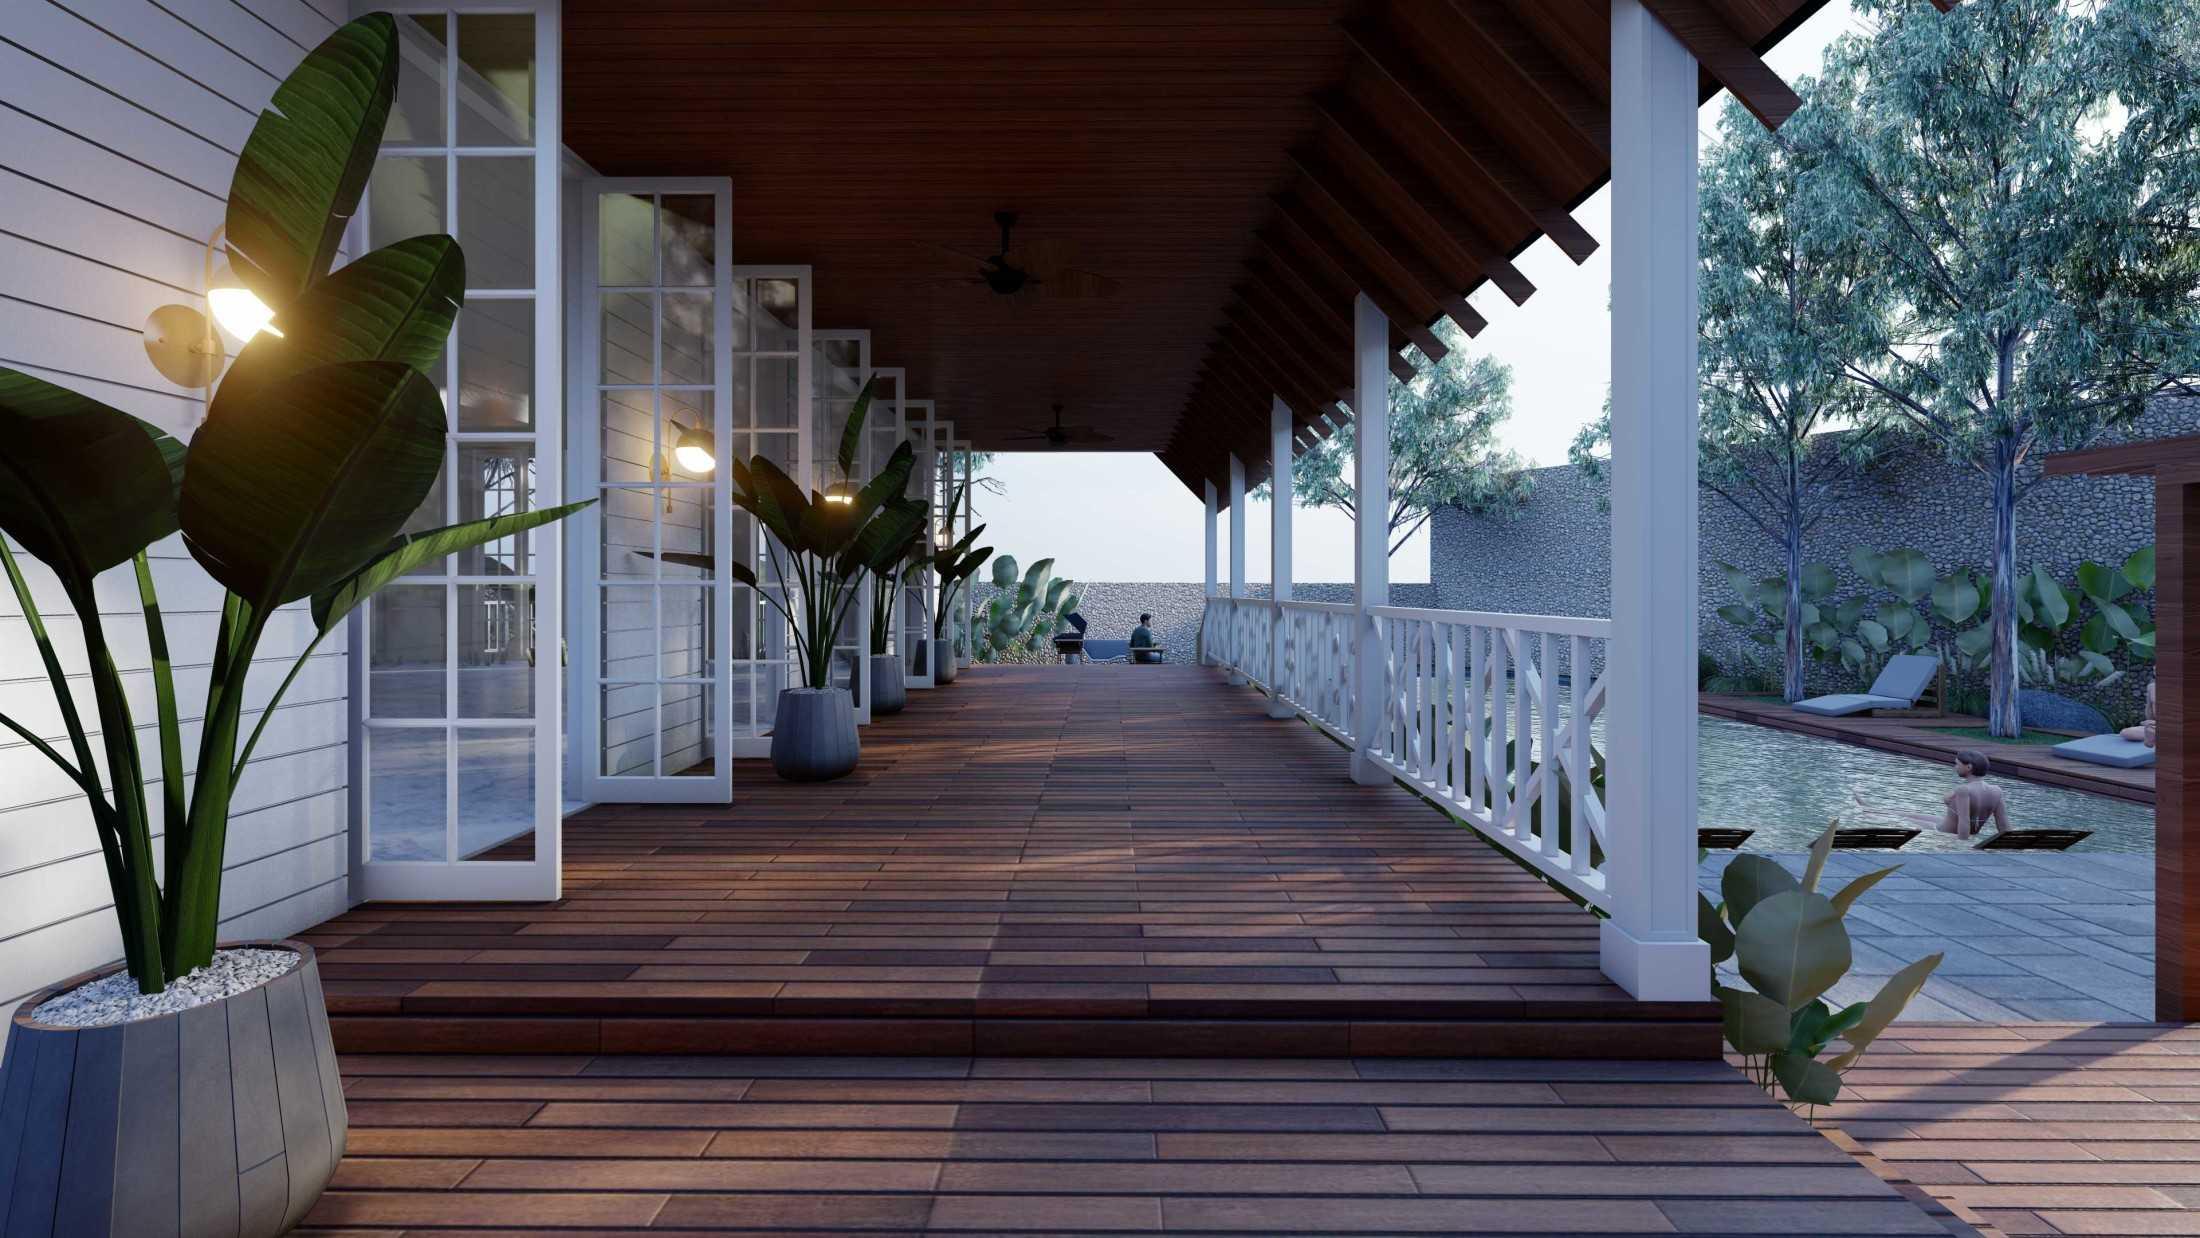 Mahastudio & Partner Villa Canggu Canggu, Kuta Utara, Kabupaten Badung, Bali, Indonesia Canggu, Kuta Utara, Kabupaten Badung, Bali, Indonesia Mahastudio-Partner-Villa-Canggu  97194